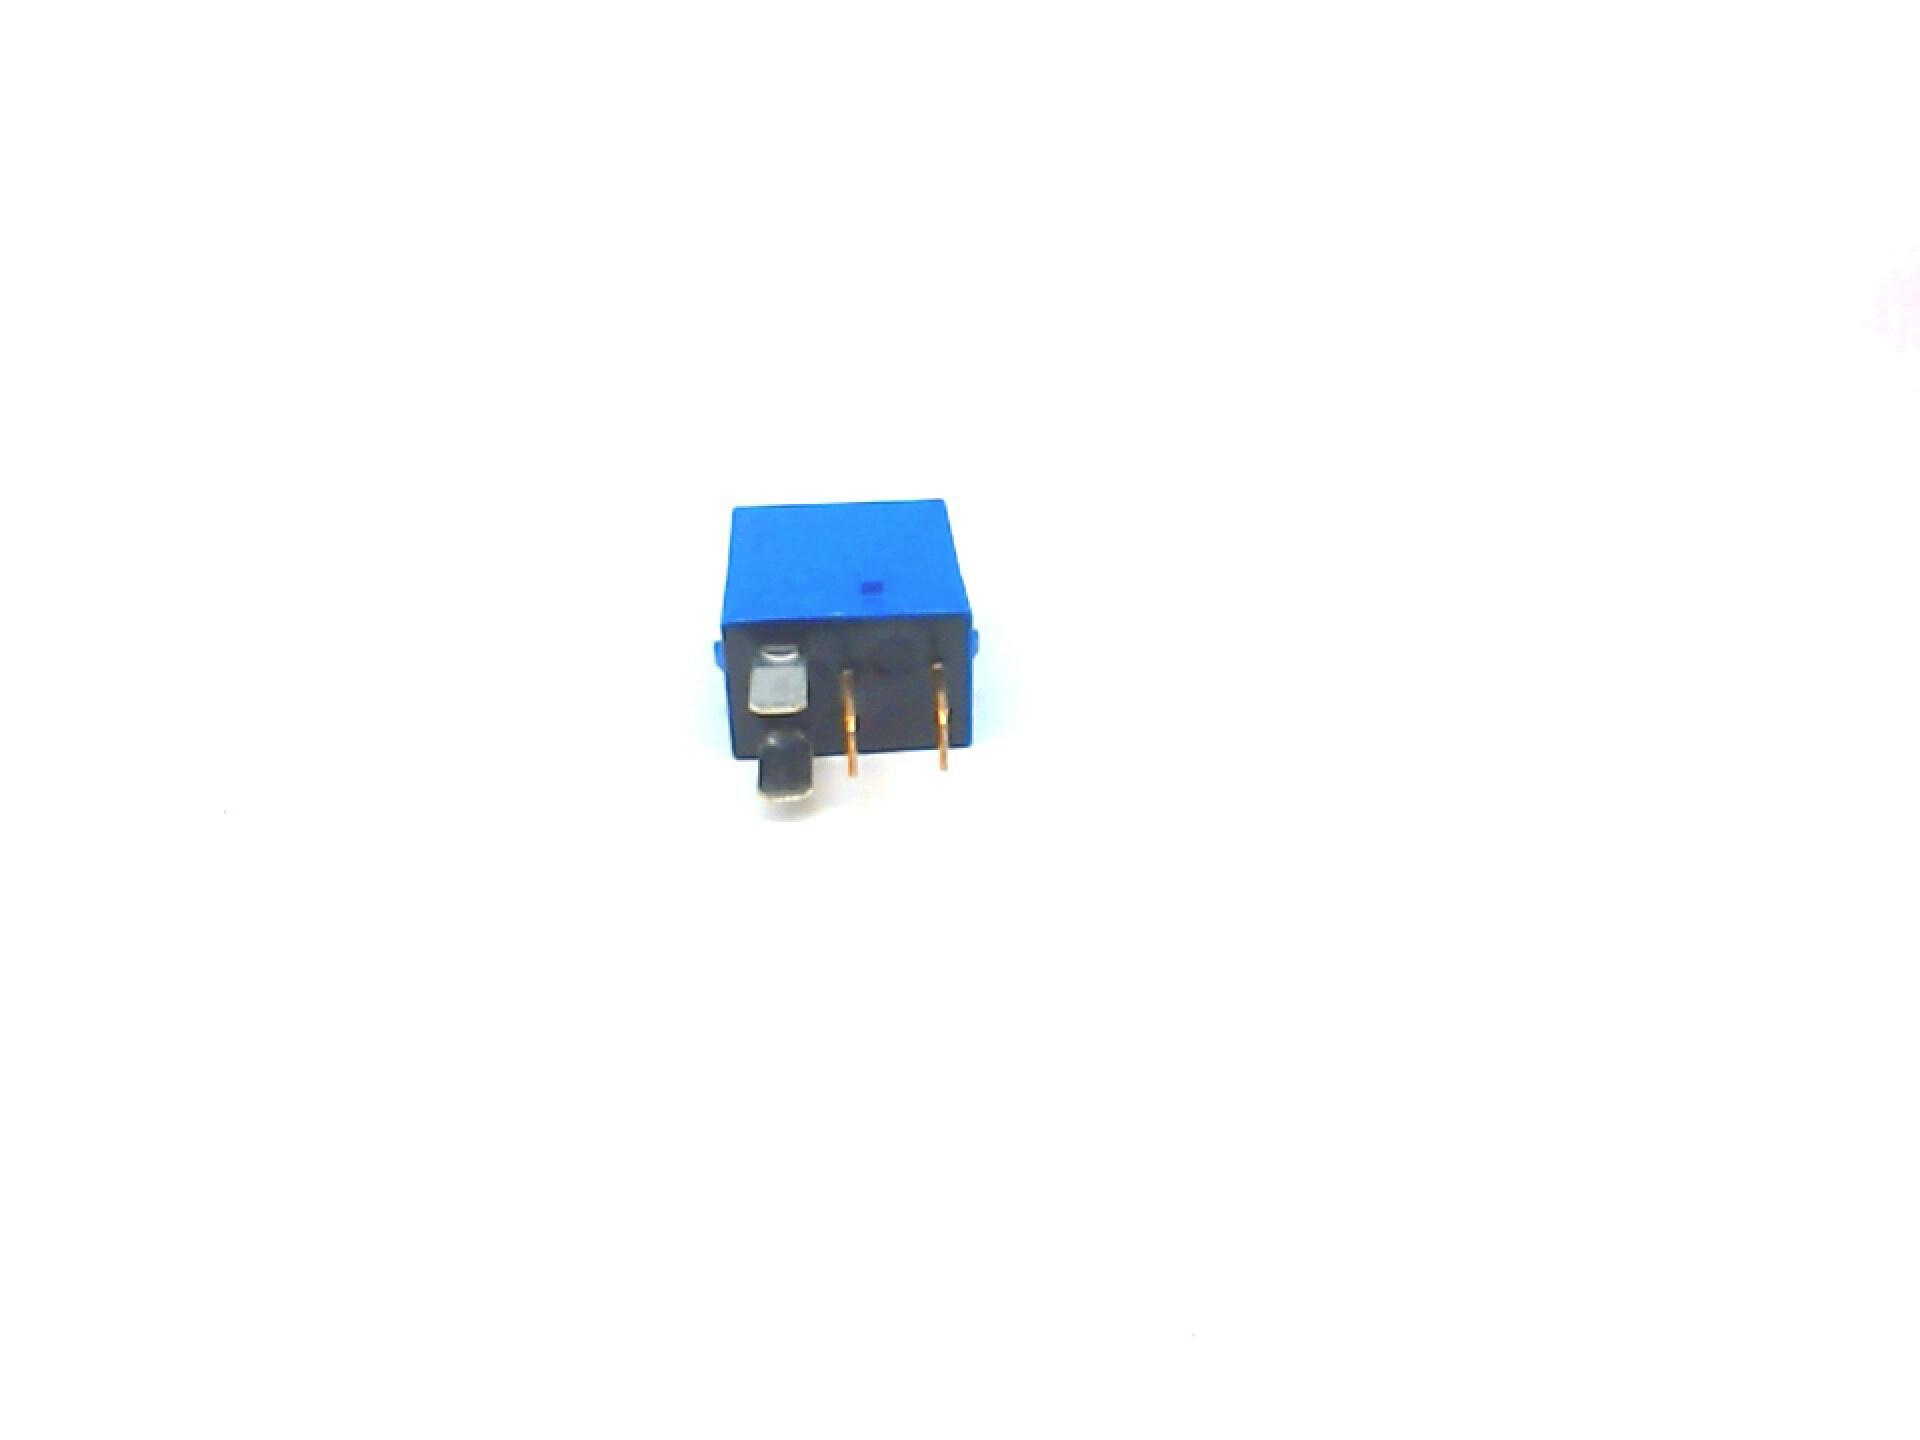 82501ag05b - Relay  Electrical  Body  Box